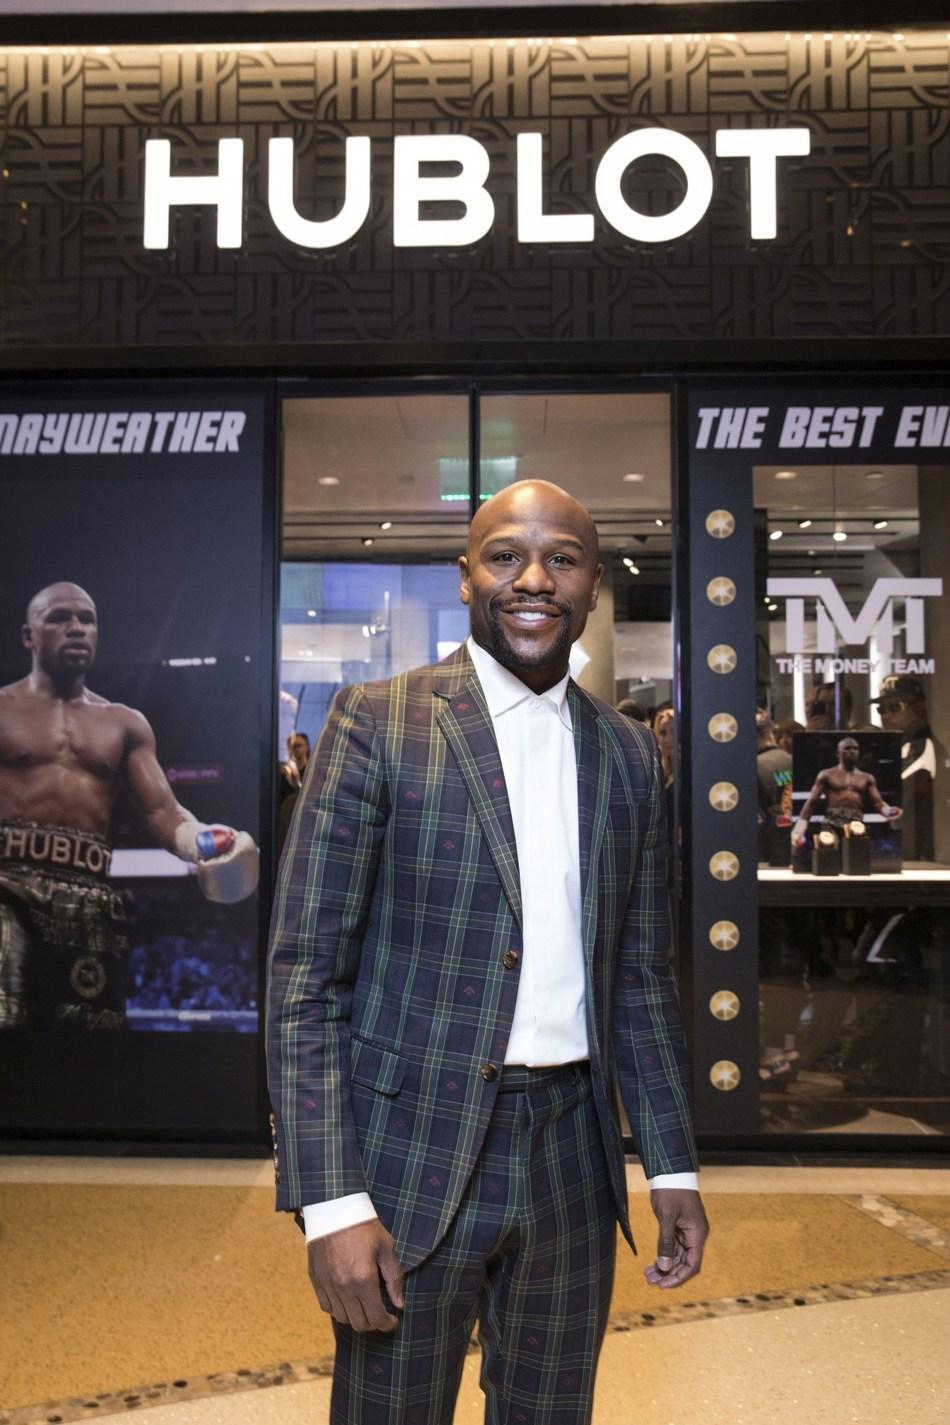 Floyd Mayweather at the Hublot Boutique Crystals Mall Las Vegas (PRNewsfoto/Hublot)